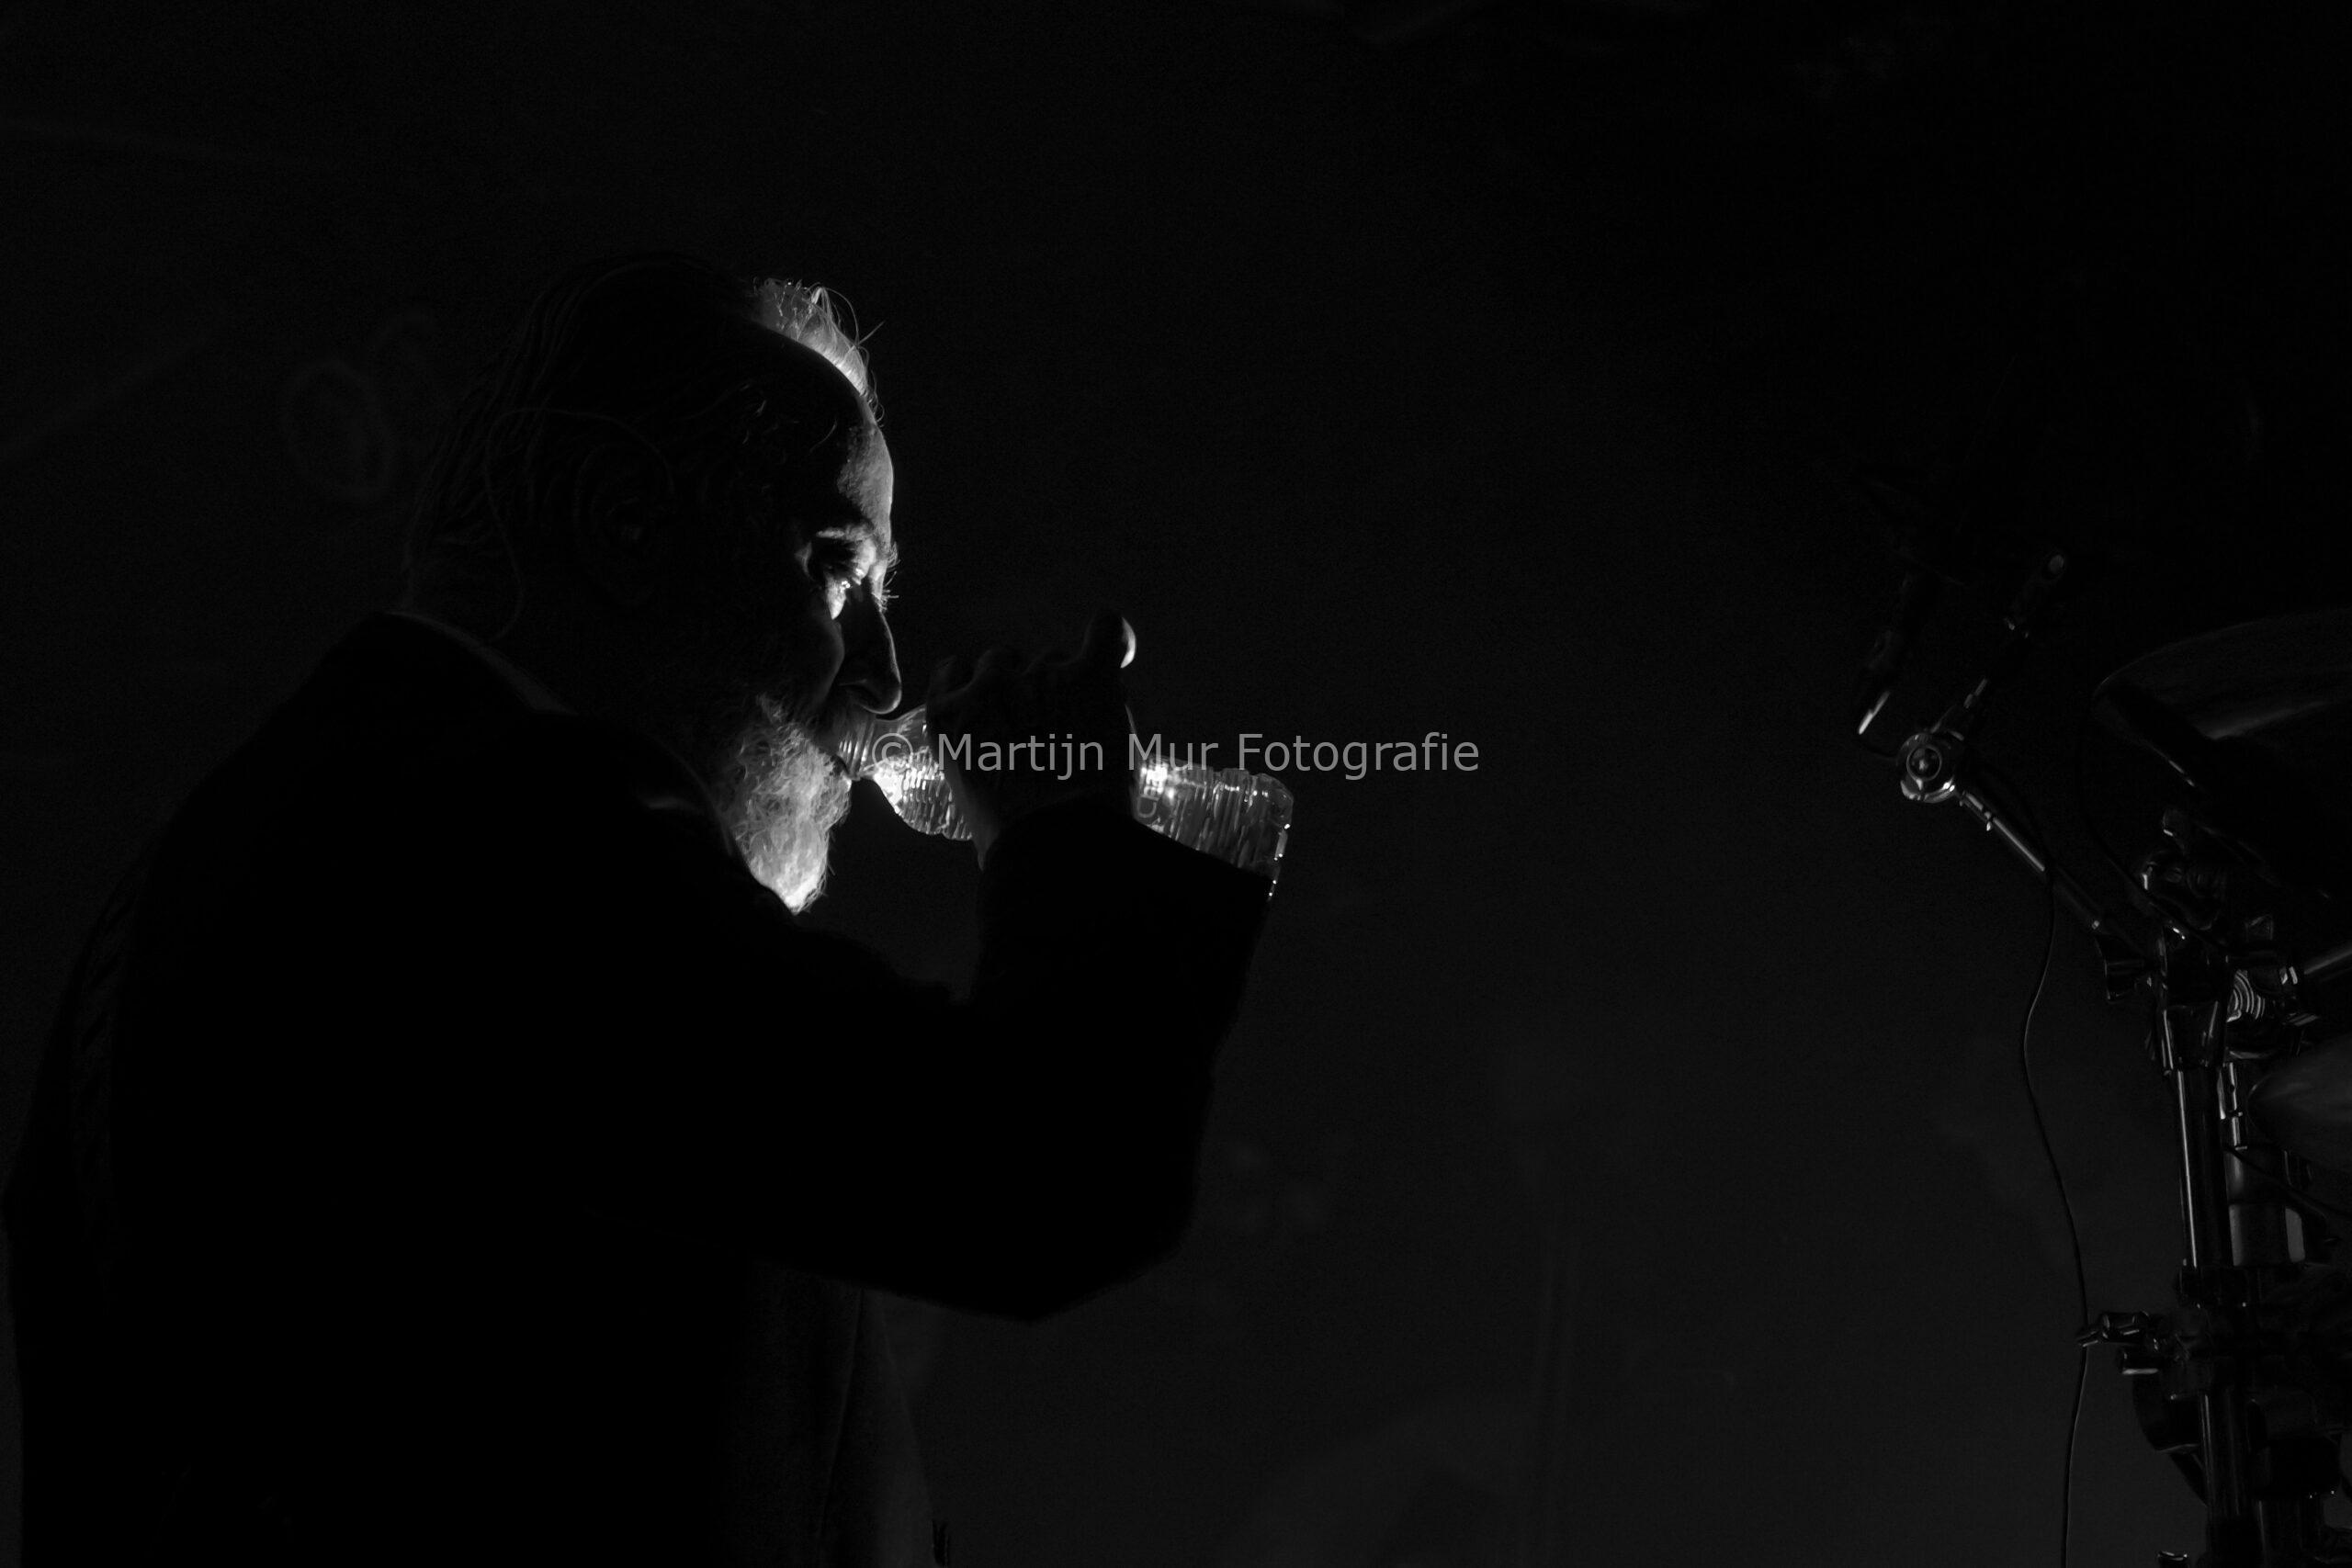 concertfotografie, portretfotografie, Jack Poels, Rowwen Hèze